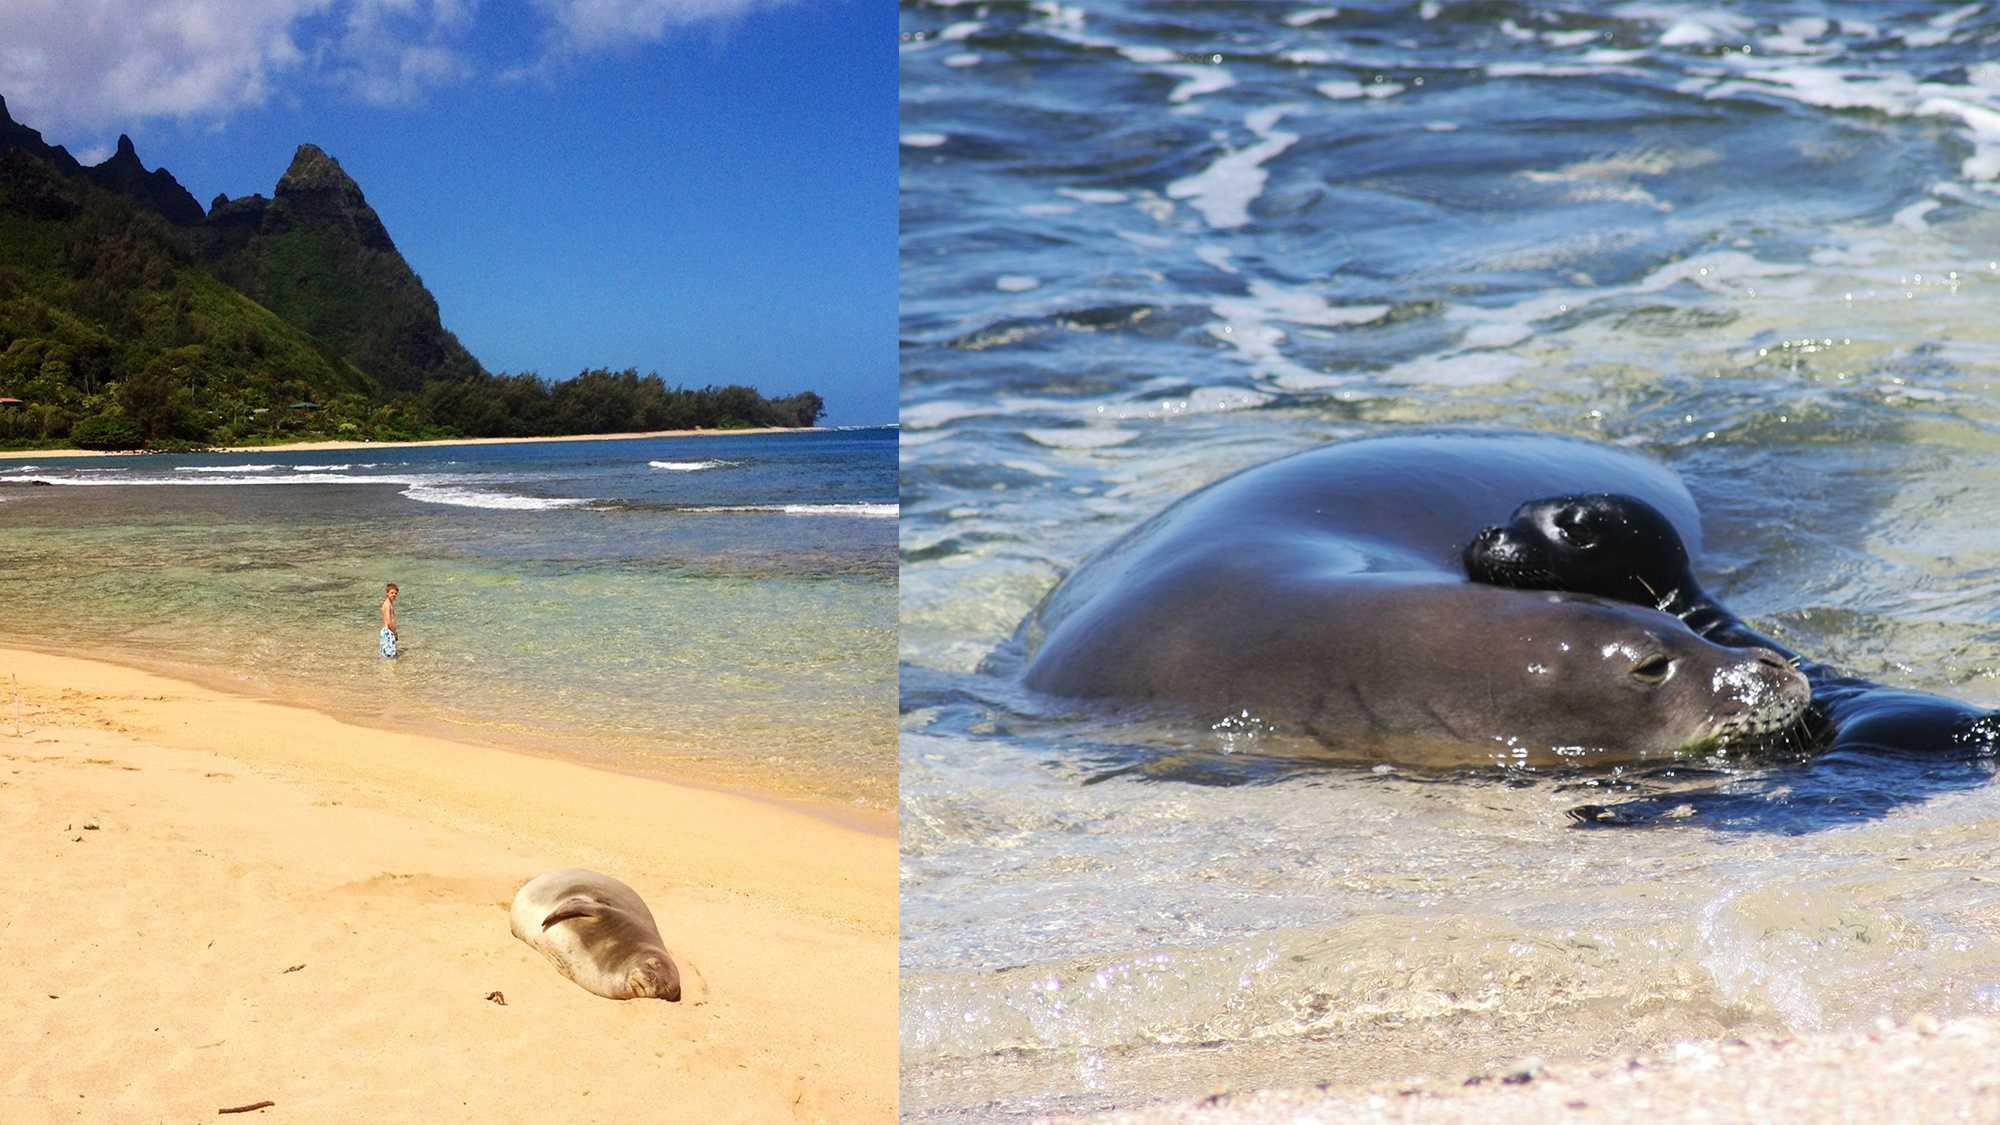 A wild Hawaiian monk seal sleeps on a beach in Kauai.